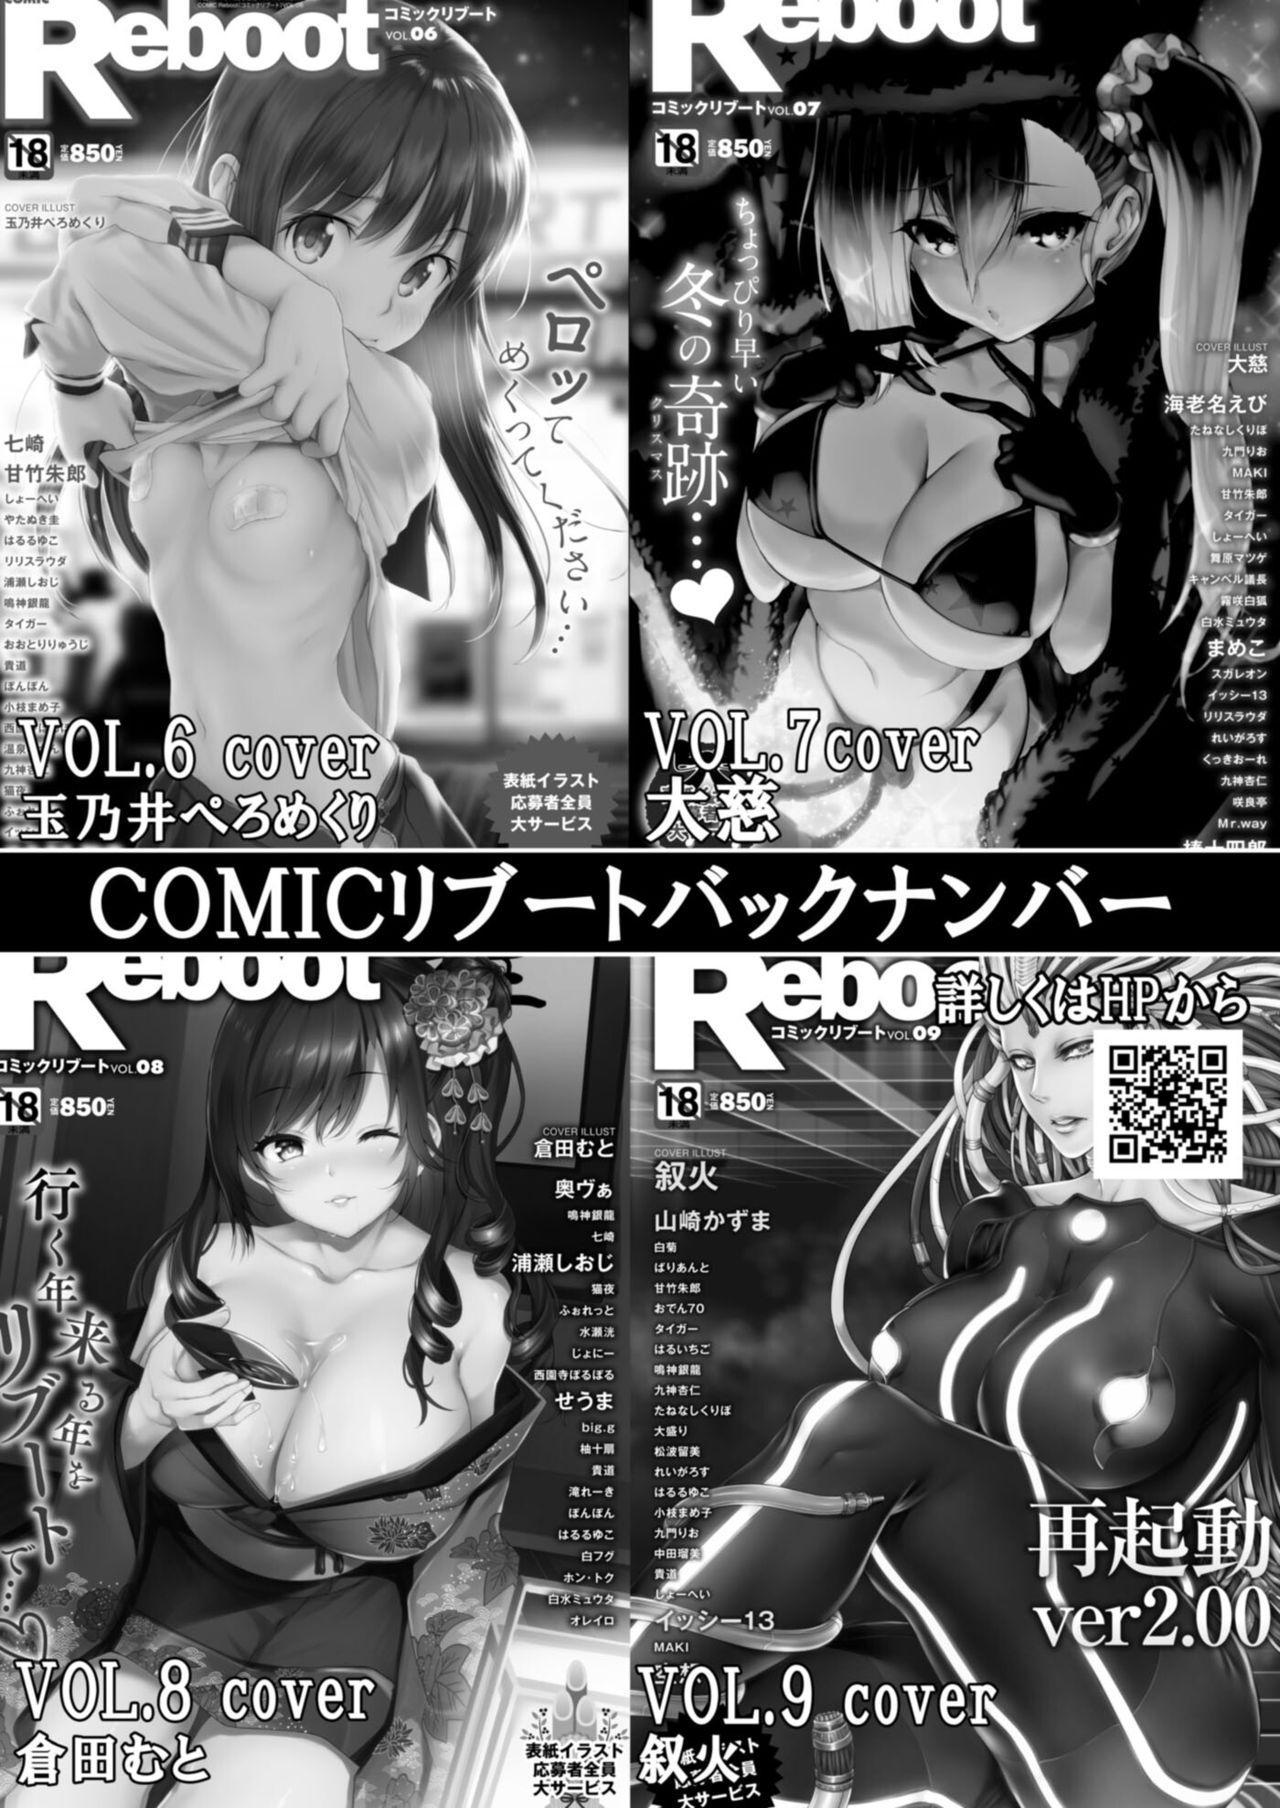 COMIC Reboot Vol. 11 510